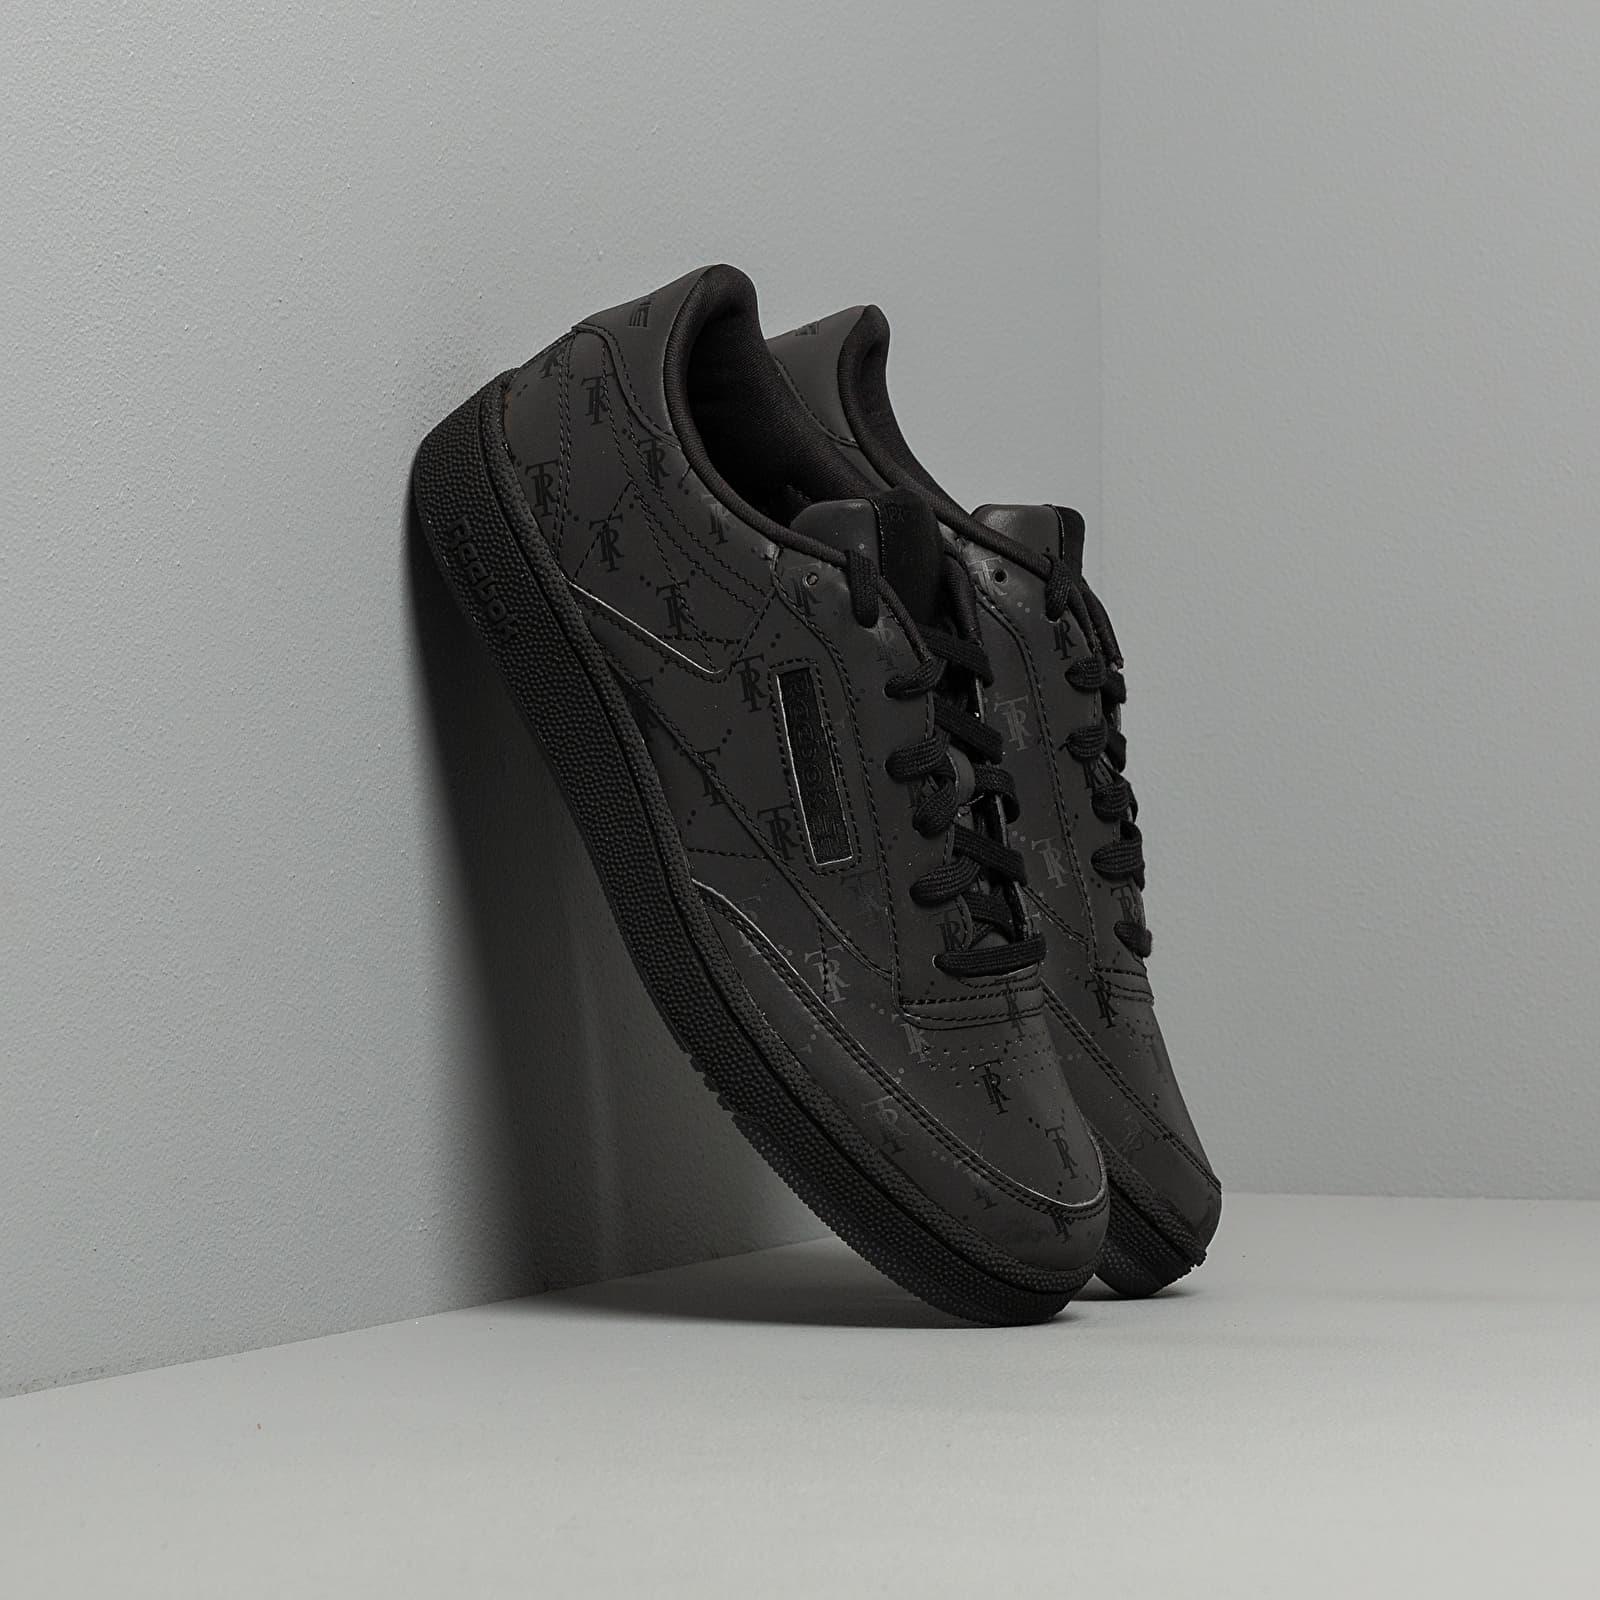 Férfi cipők Reebok x Trés Rasché Club C 85 MU Black/ Black/ Black